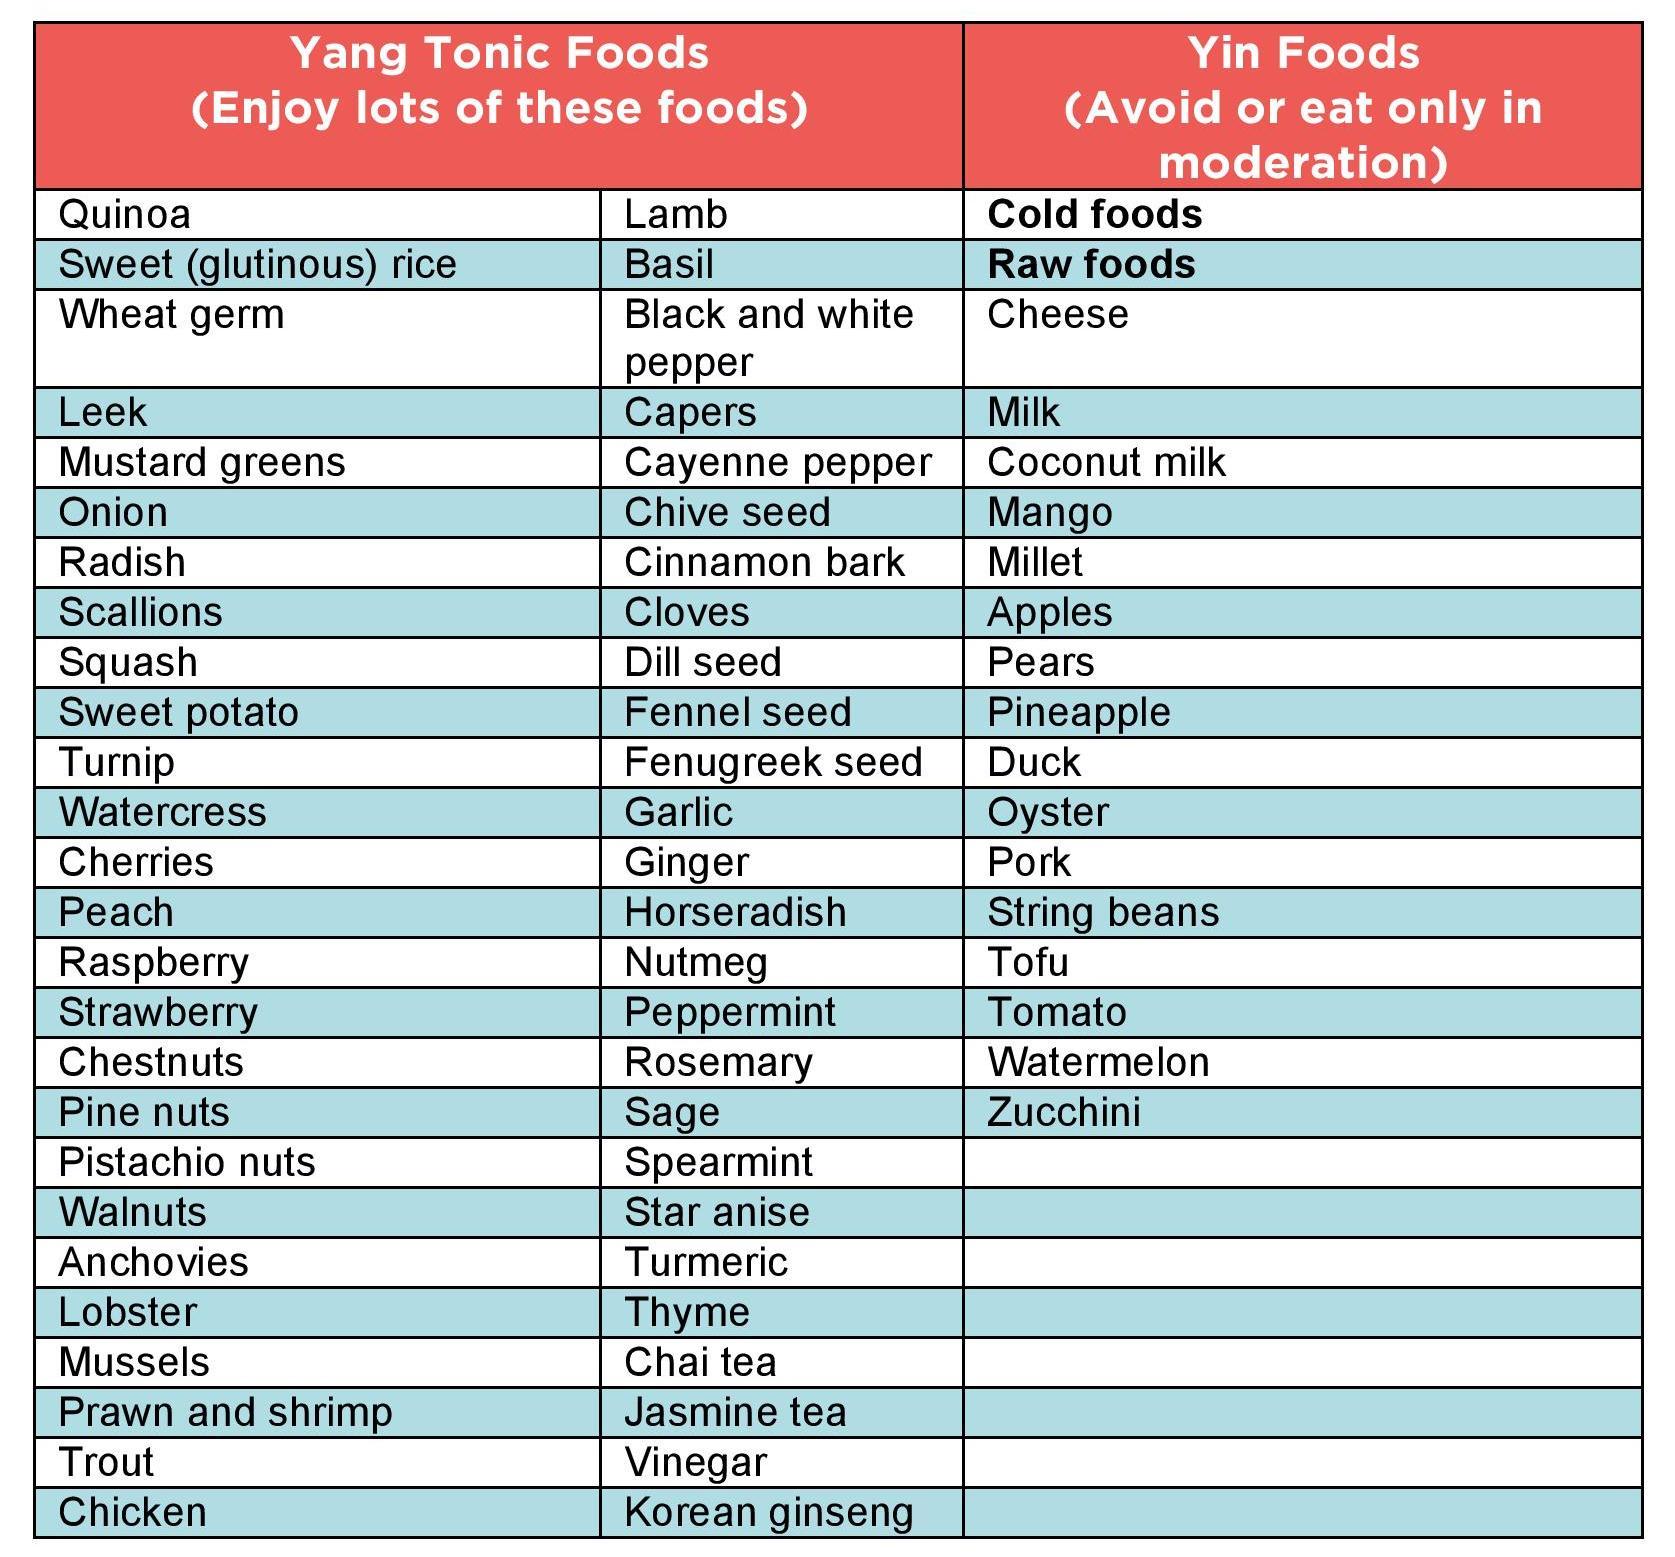 Yang Tonic Foods